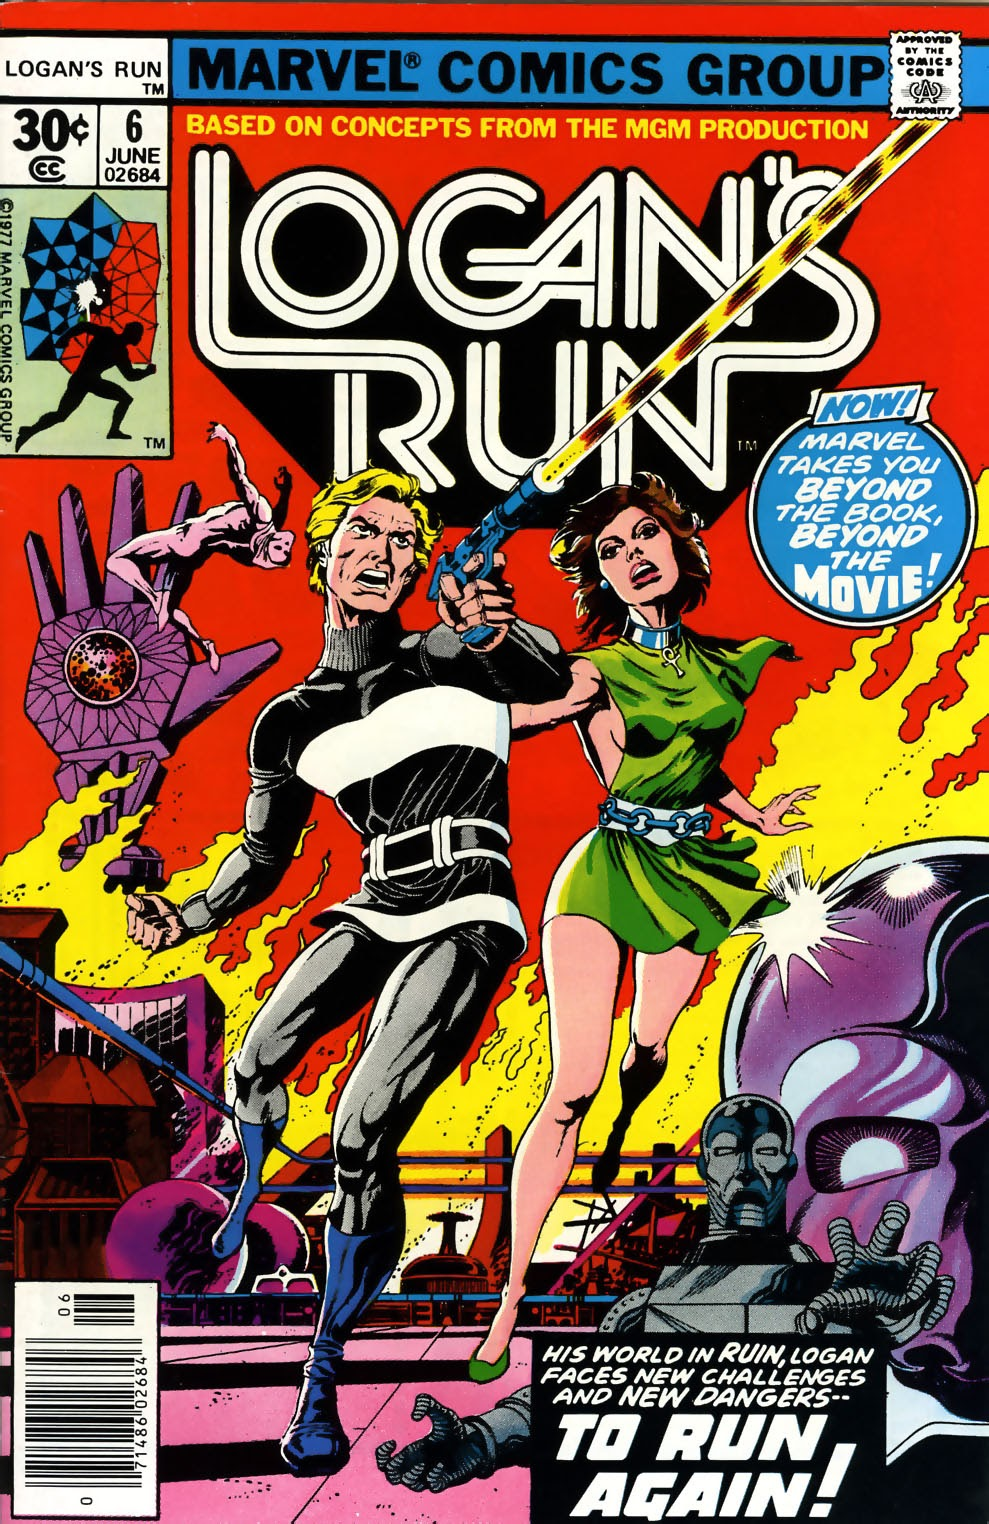 Logan's Run (1977) issue 6 - Page 1